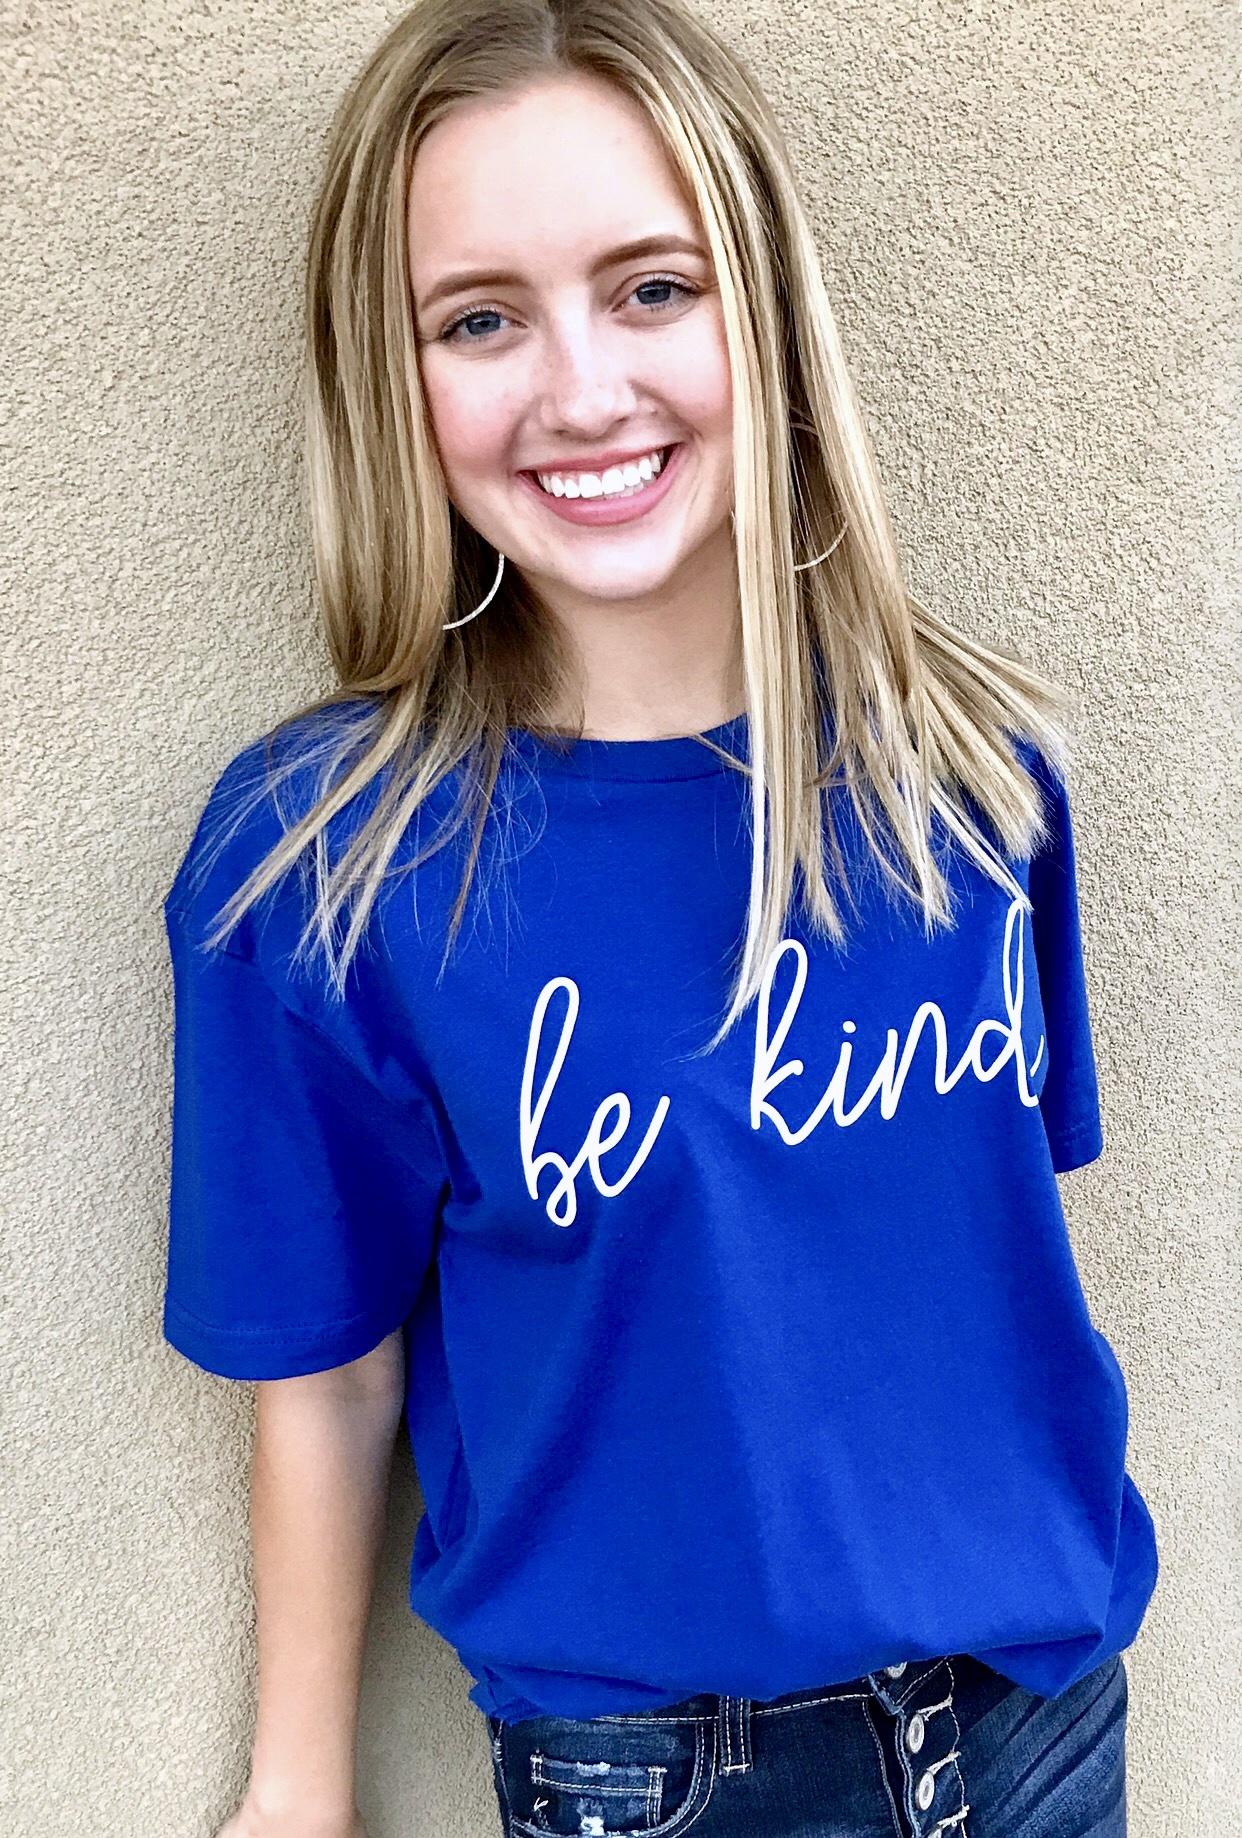 Blue "Be Kind" T-shirt